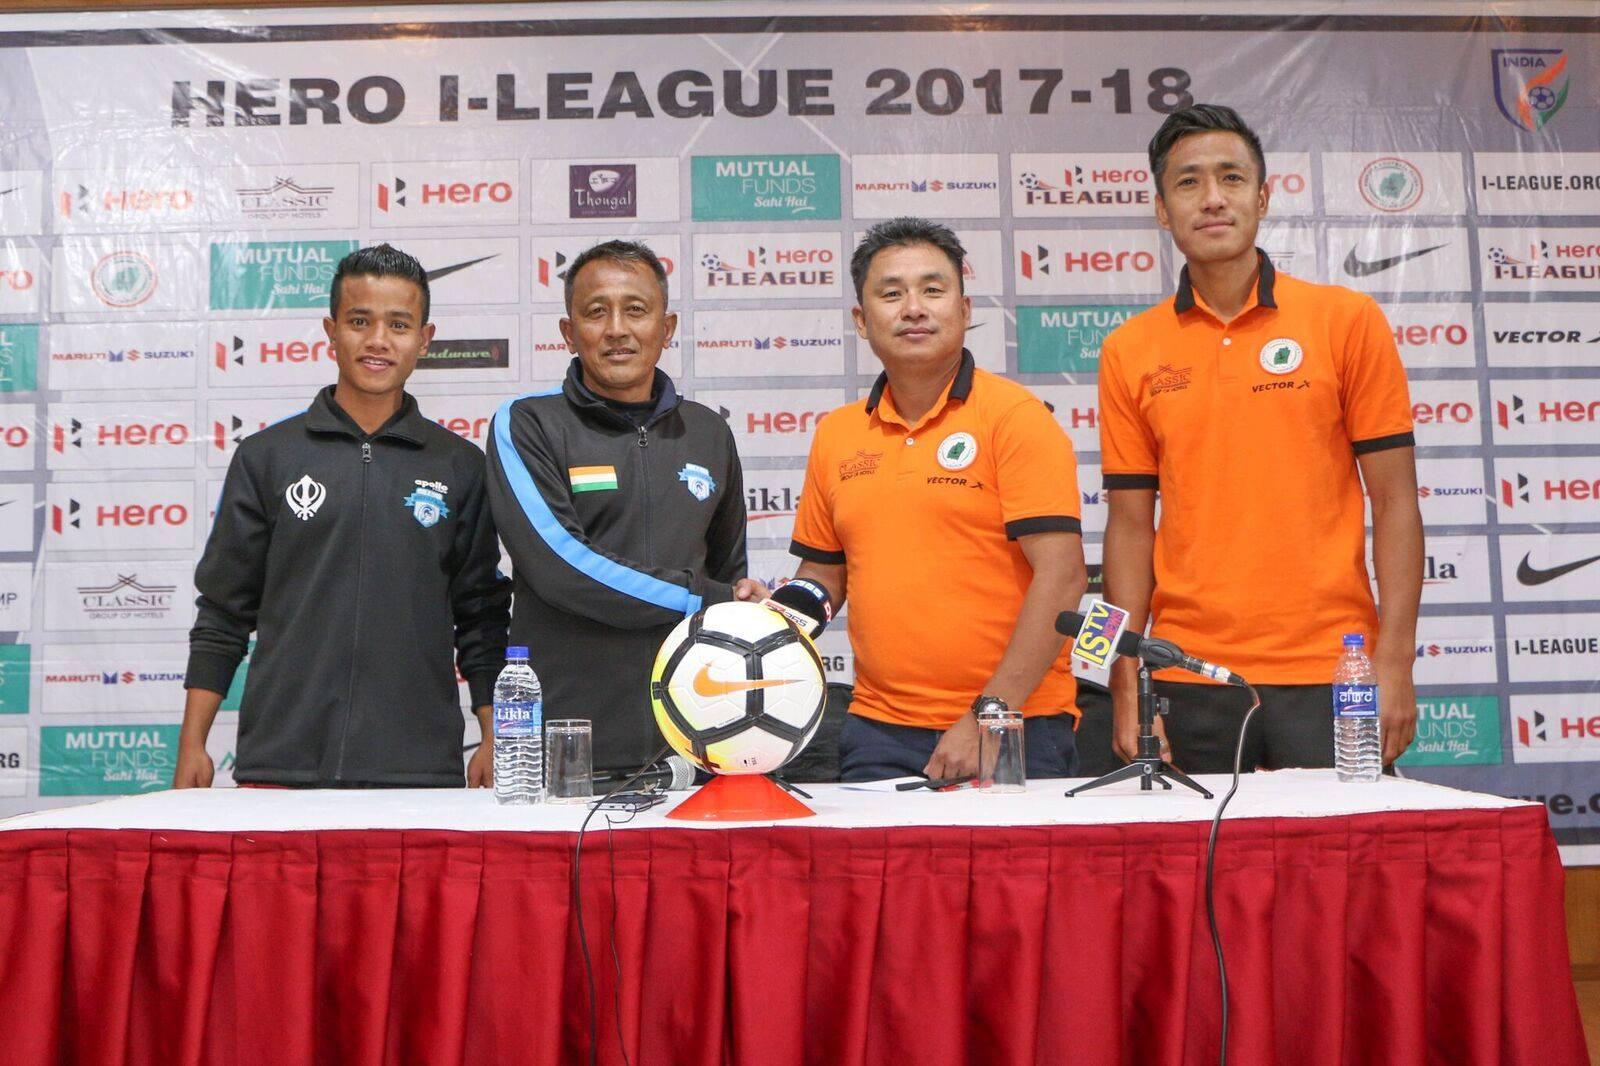 I-League ah Manipuri coach pahnih inchibai